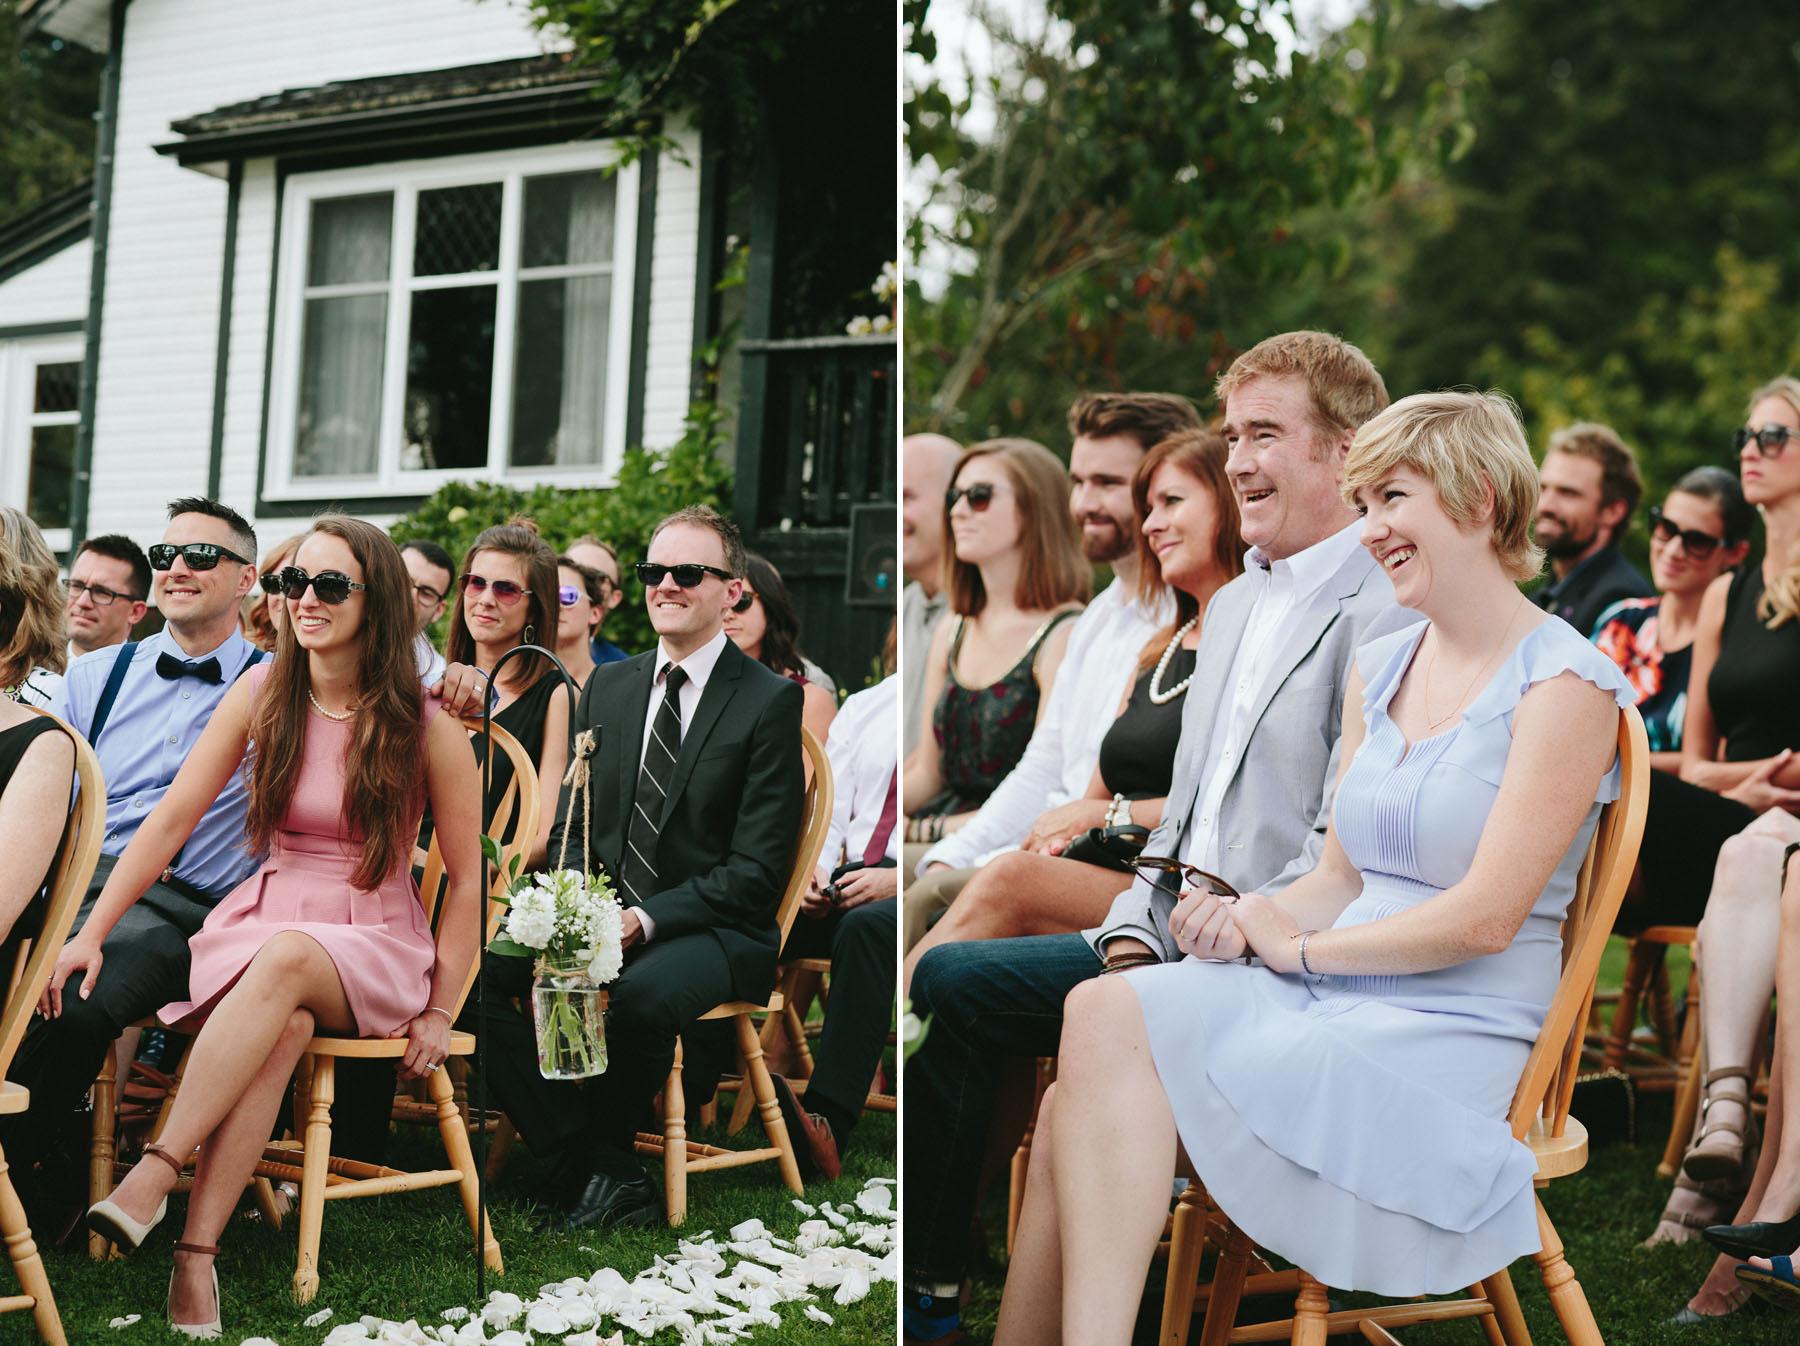 thetis-island-wedding-photographer-rp-rn-099.jpg